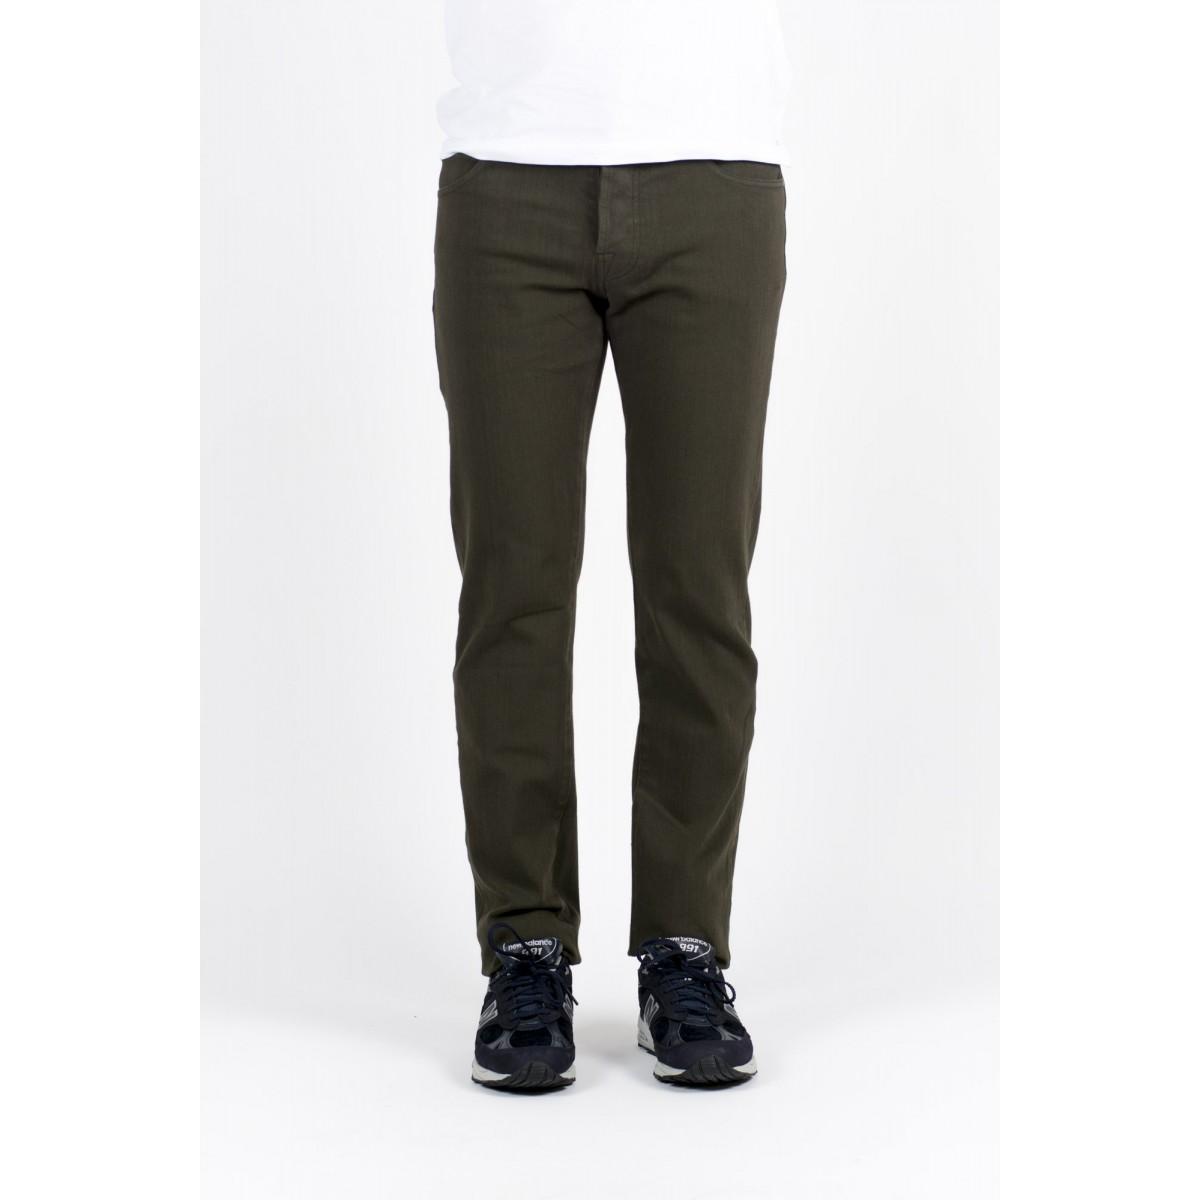 Pantalone uomo Thinple - Six 46 twill sovratinto bielastico 535 - verde